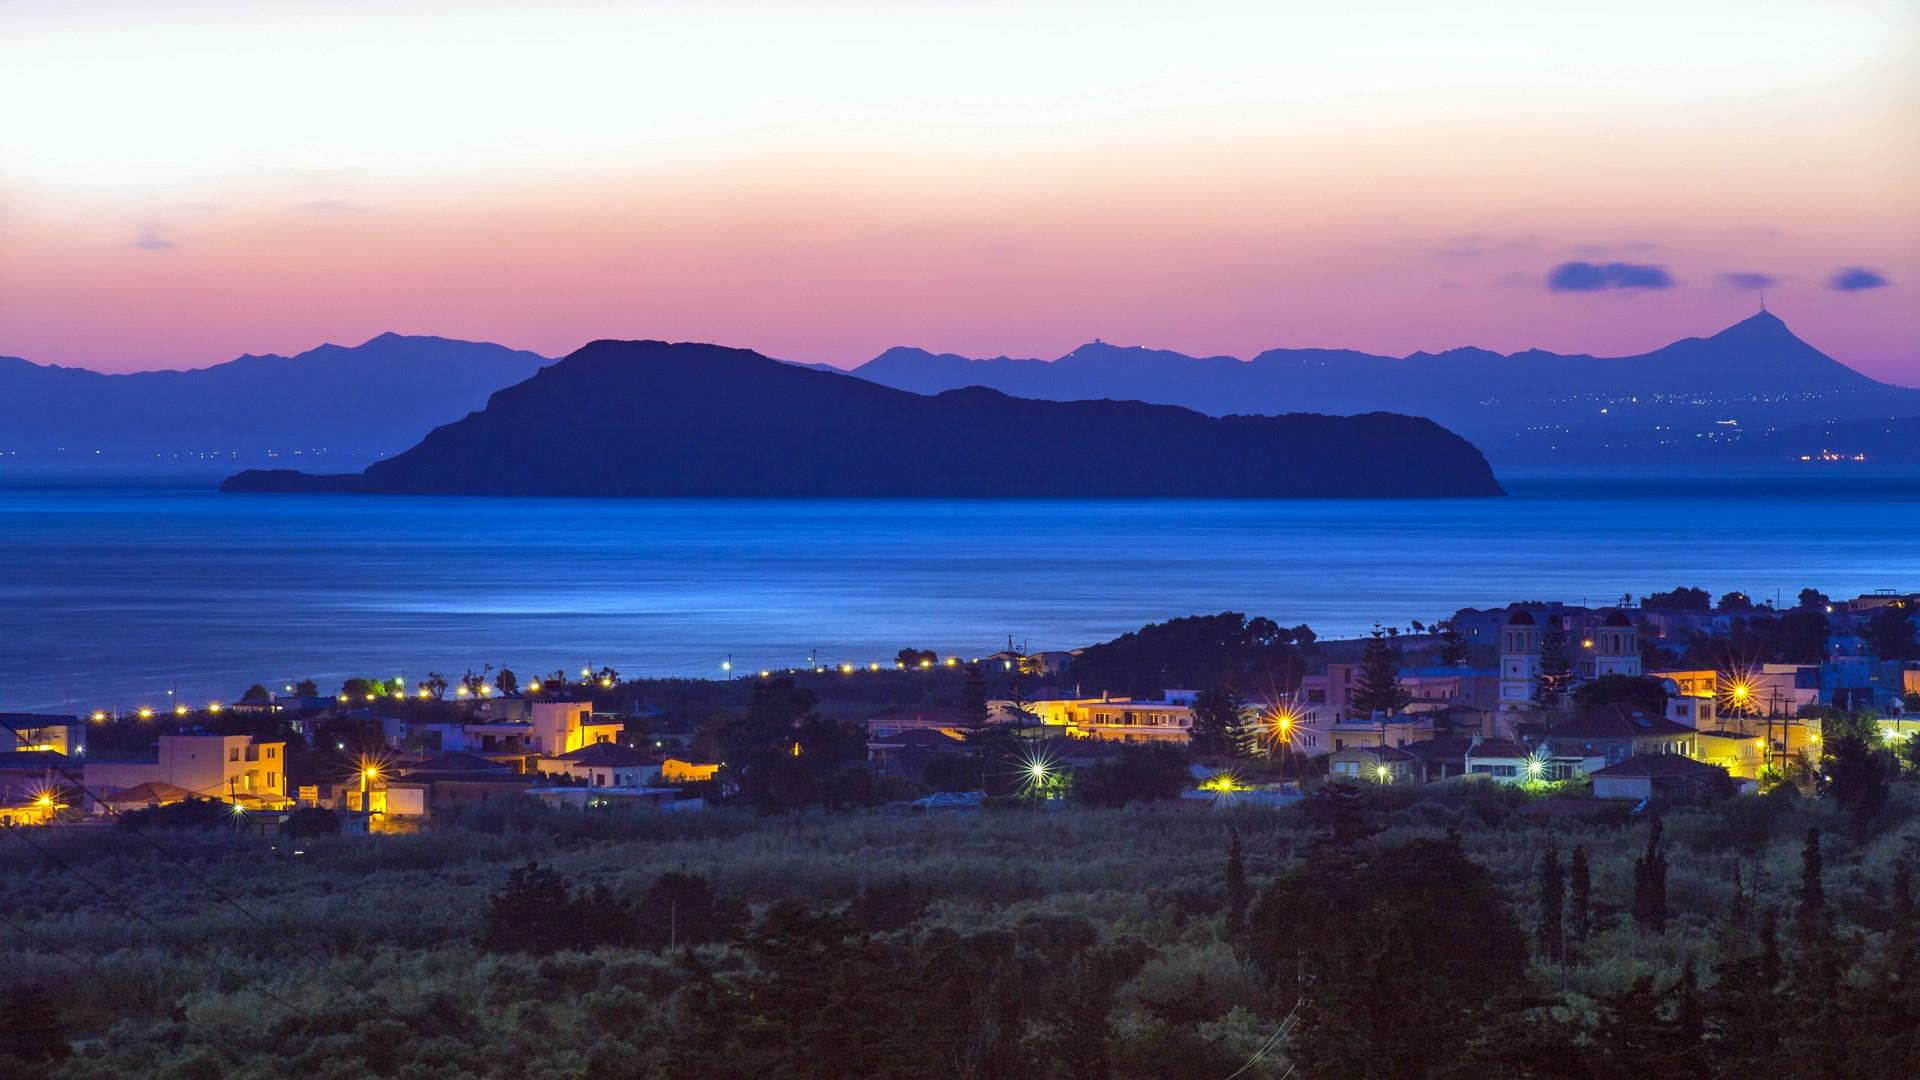 Thodorou øyene, Chania – Kreta | 26 Sep 2014  | Alargo